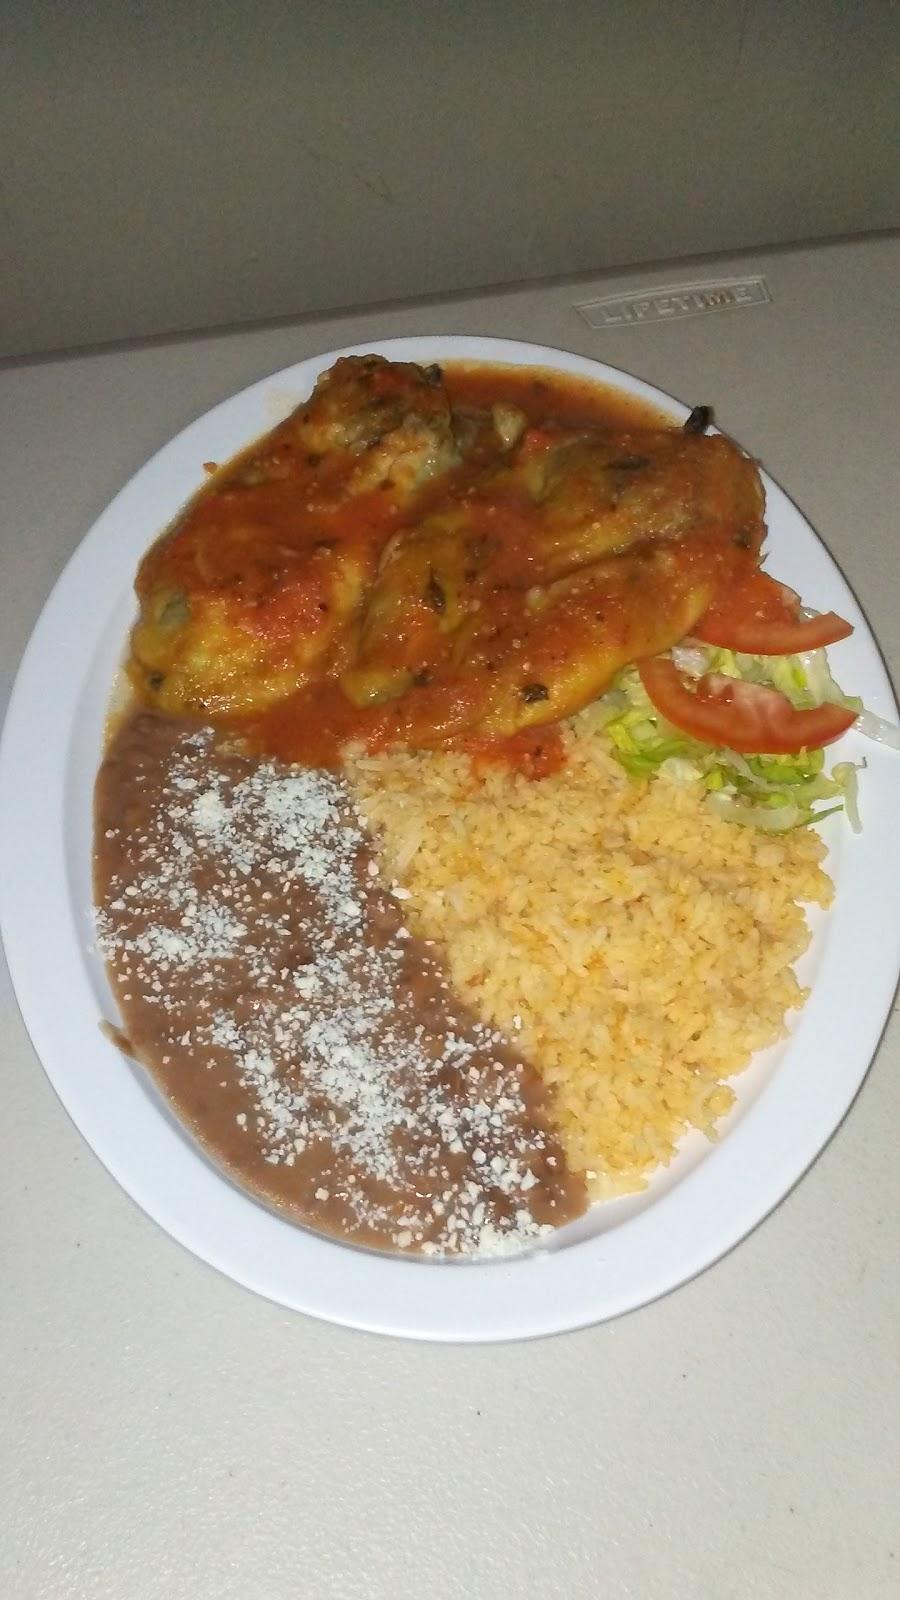 Balbuenas Mexican Restaurant - restaurant    Photo 10 of 10   Address: 10925 1/2 S. Figueroa, Los Angeles, CA 90061, USA   Phone: (323) 418-8502